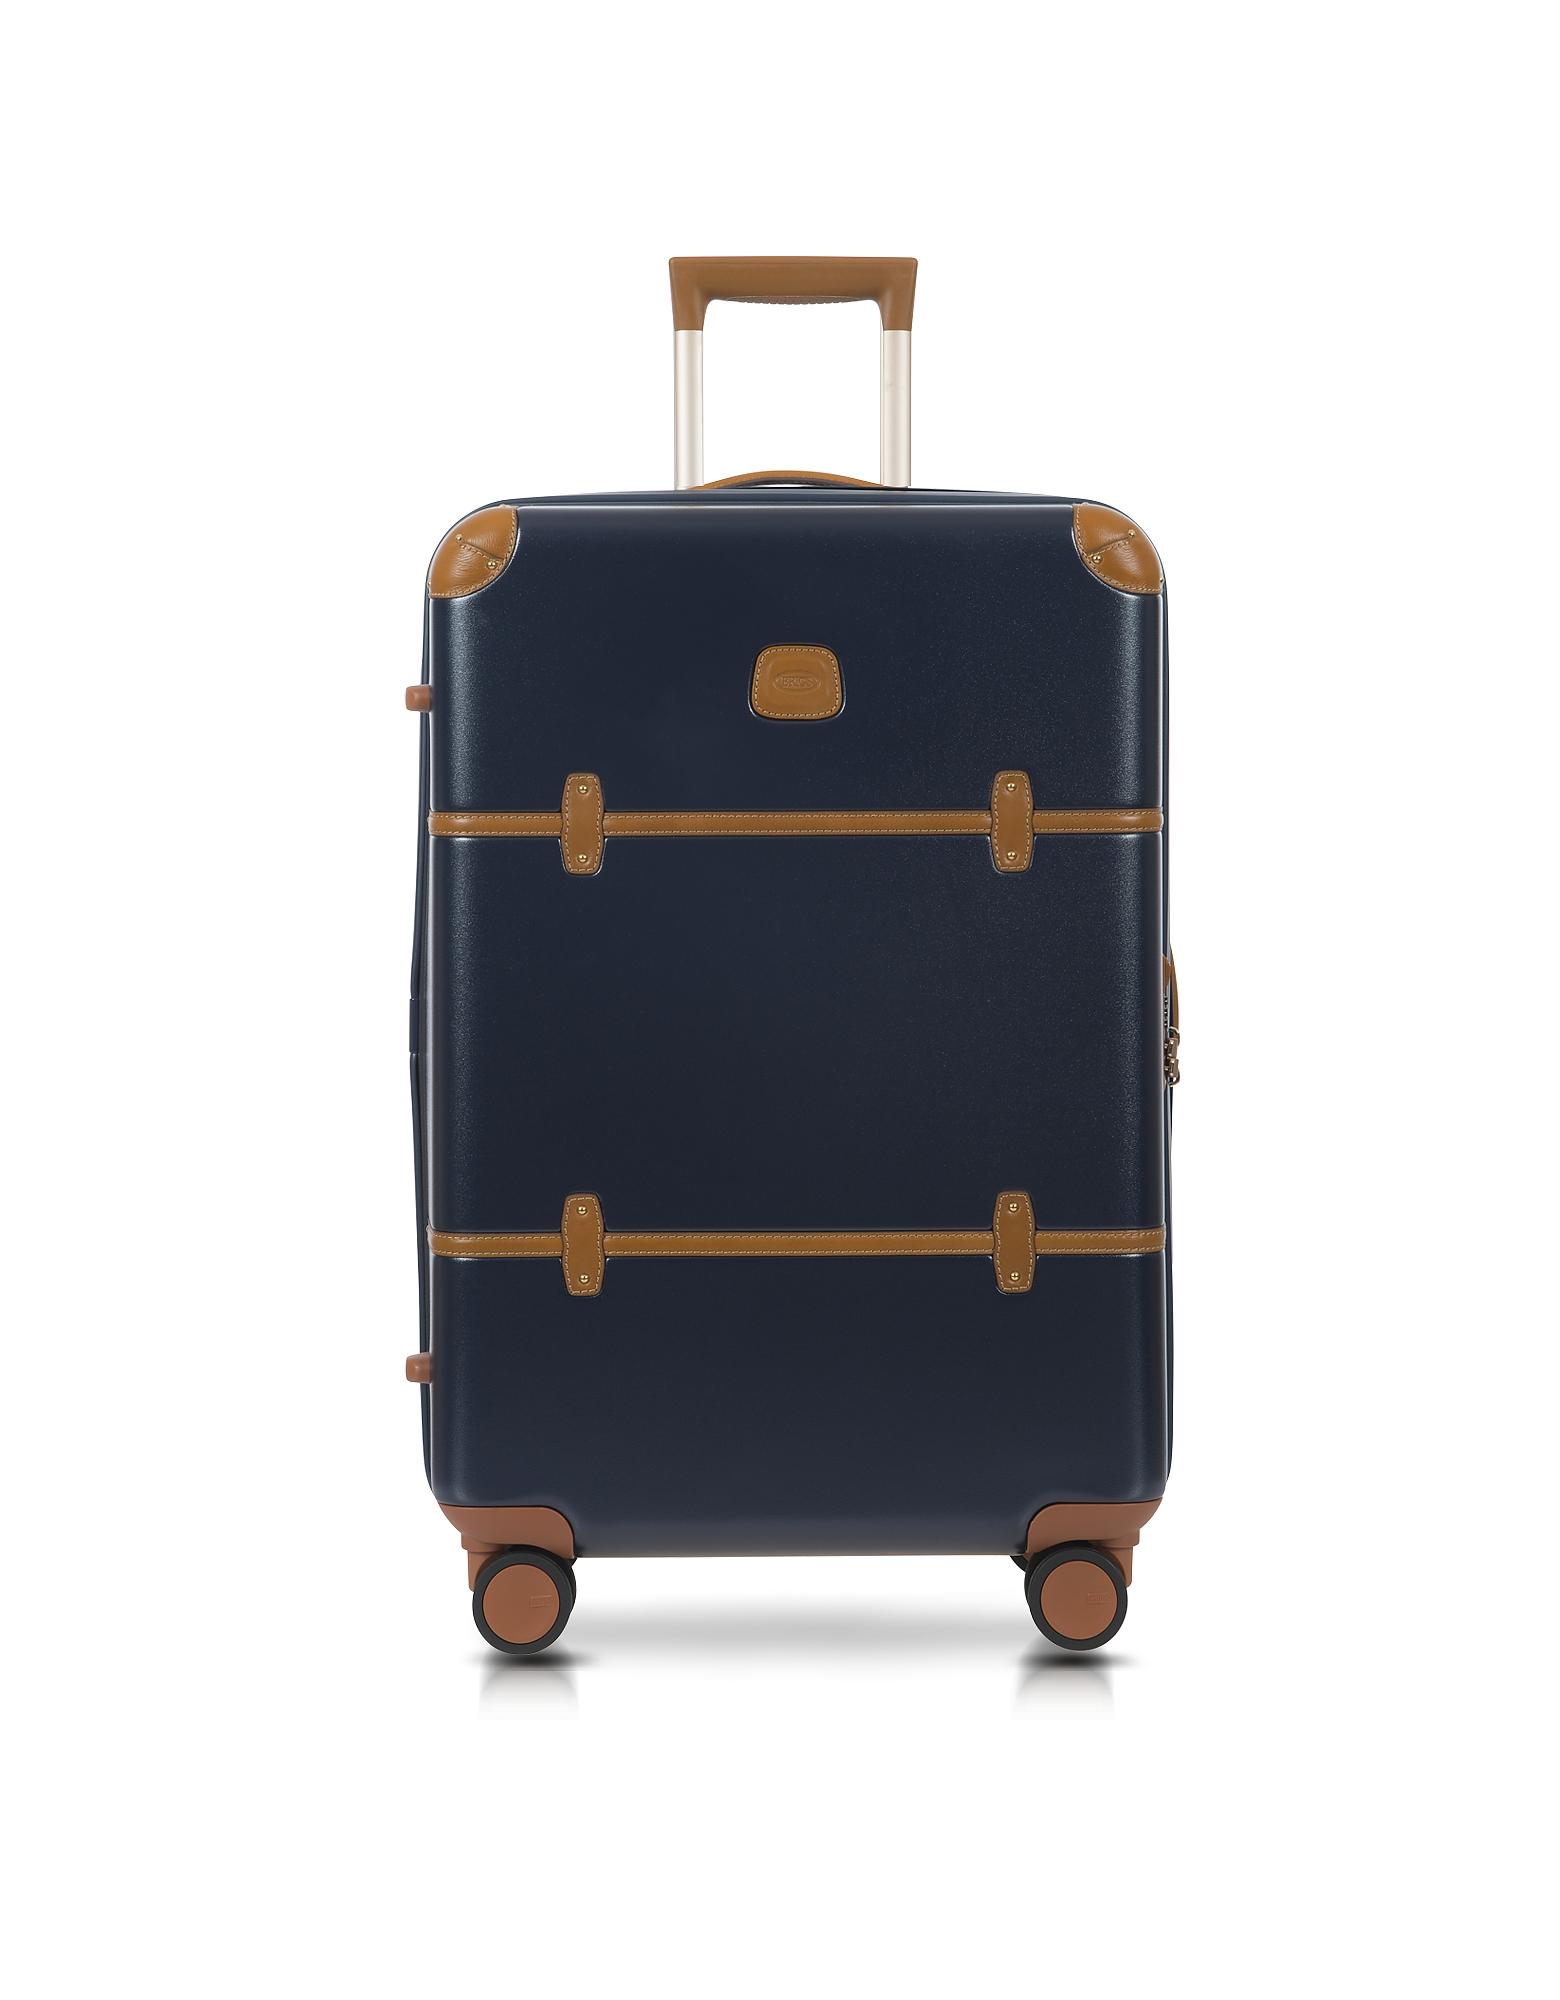 Bellagio V2.0 - Синий и Табачный Троллей 27″ на Колесиках